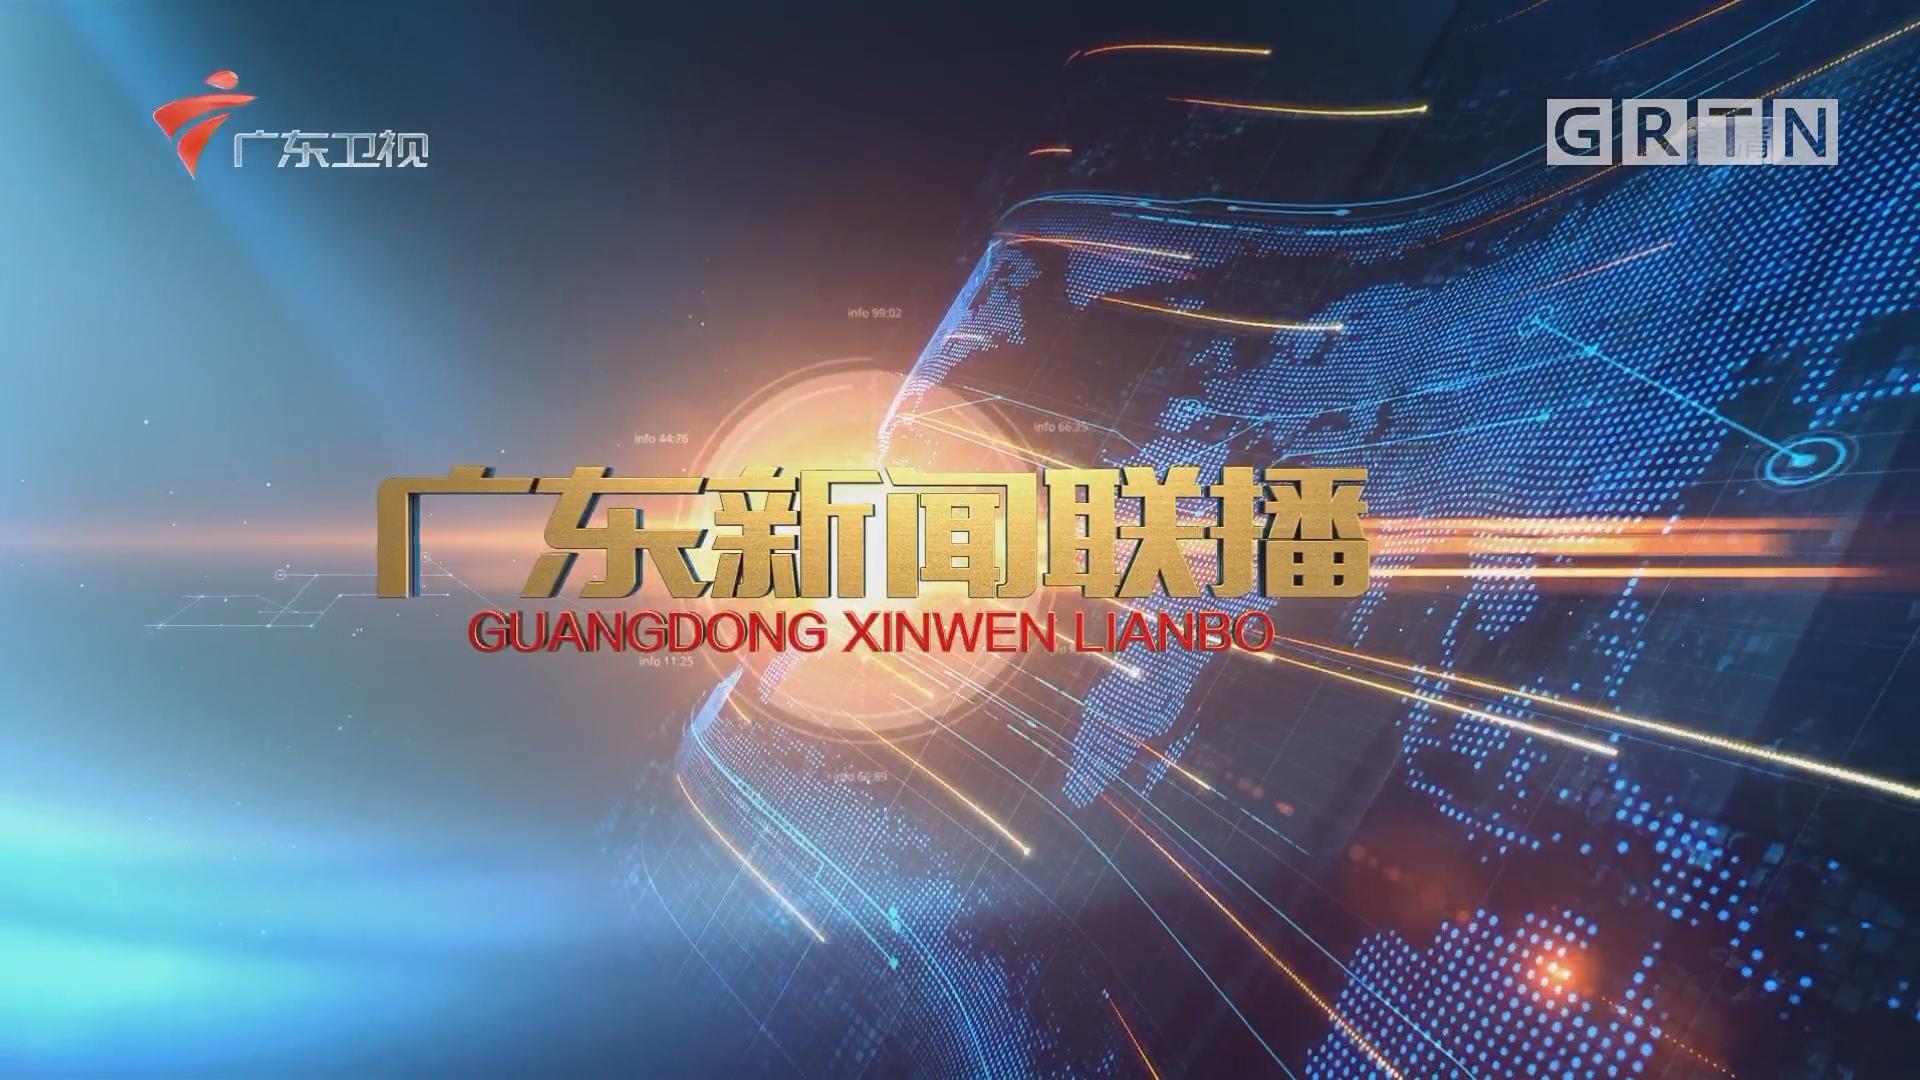 [HD][2018-11-03]广东新闻联播:省委常委会召开会议 李希主持会议